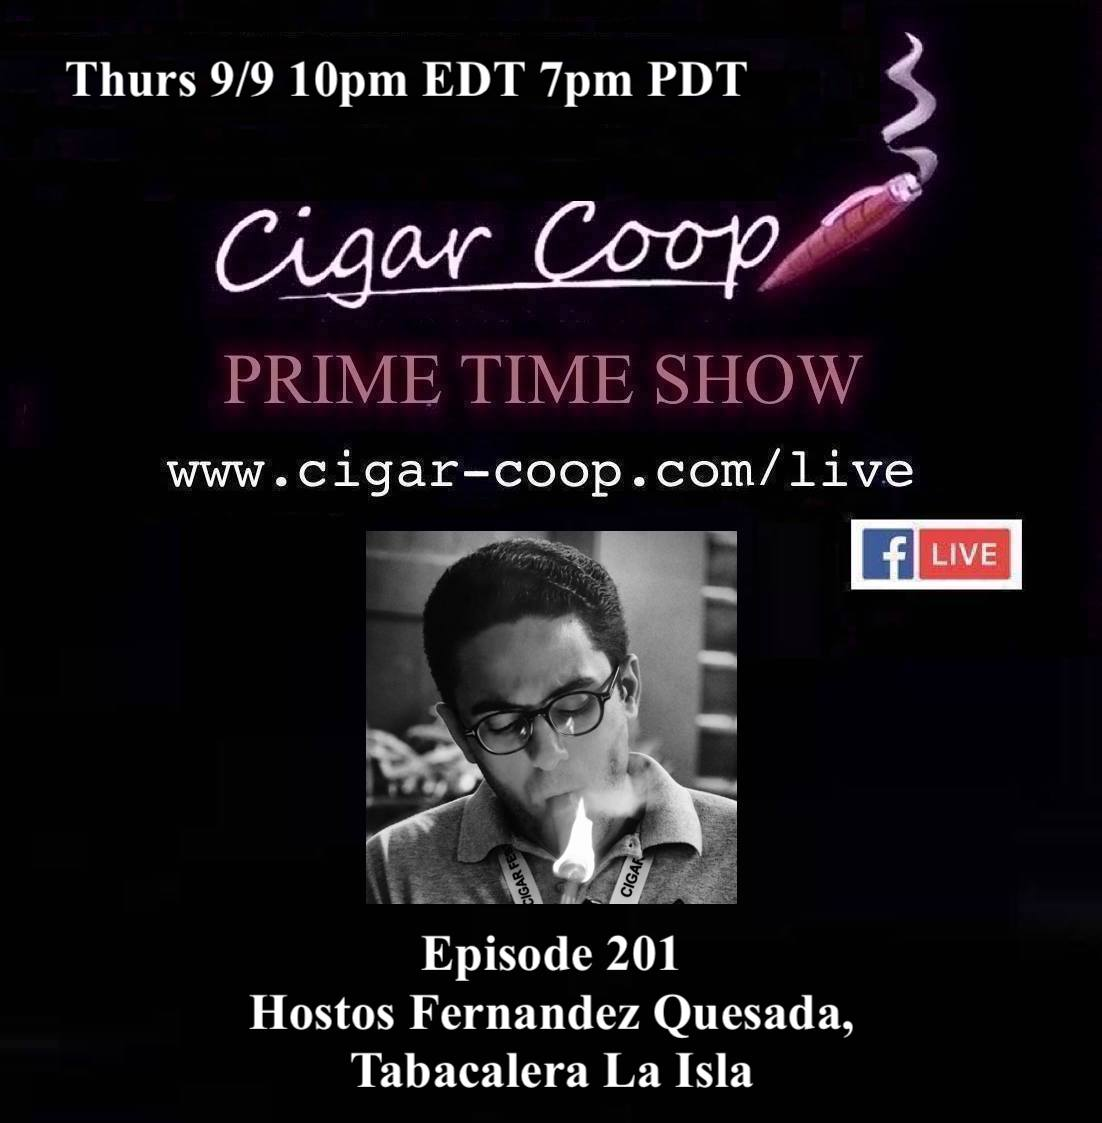 Announcement: Prime Time Episode 201 – Hostos Fernandez Quesada, Tabacalera La Isla